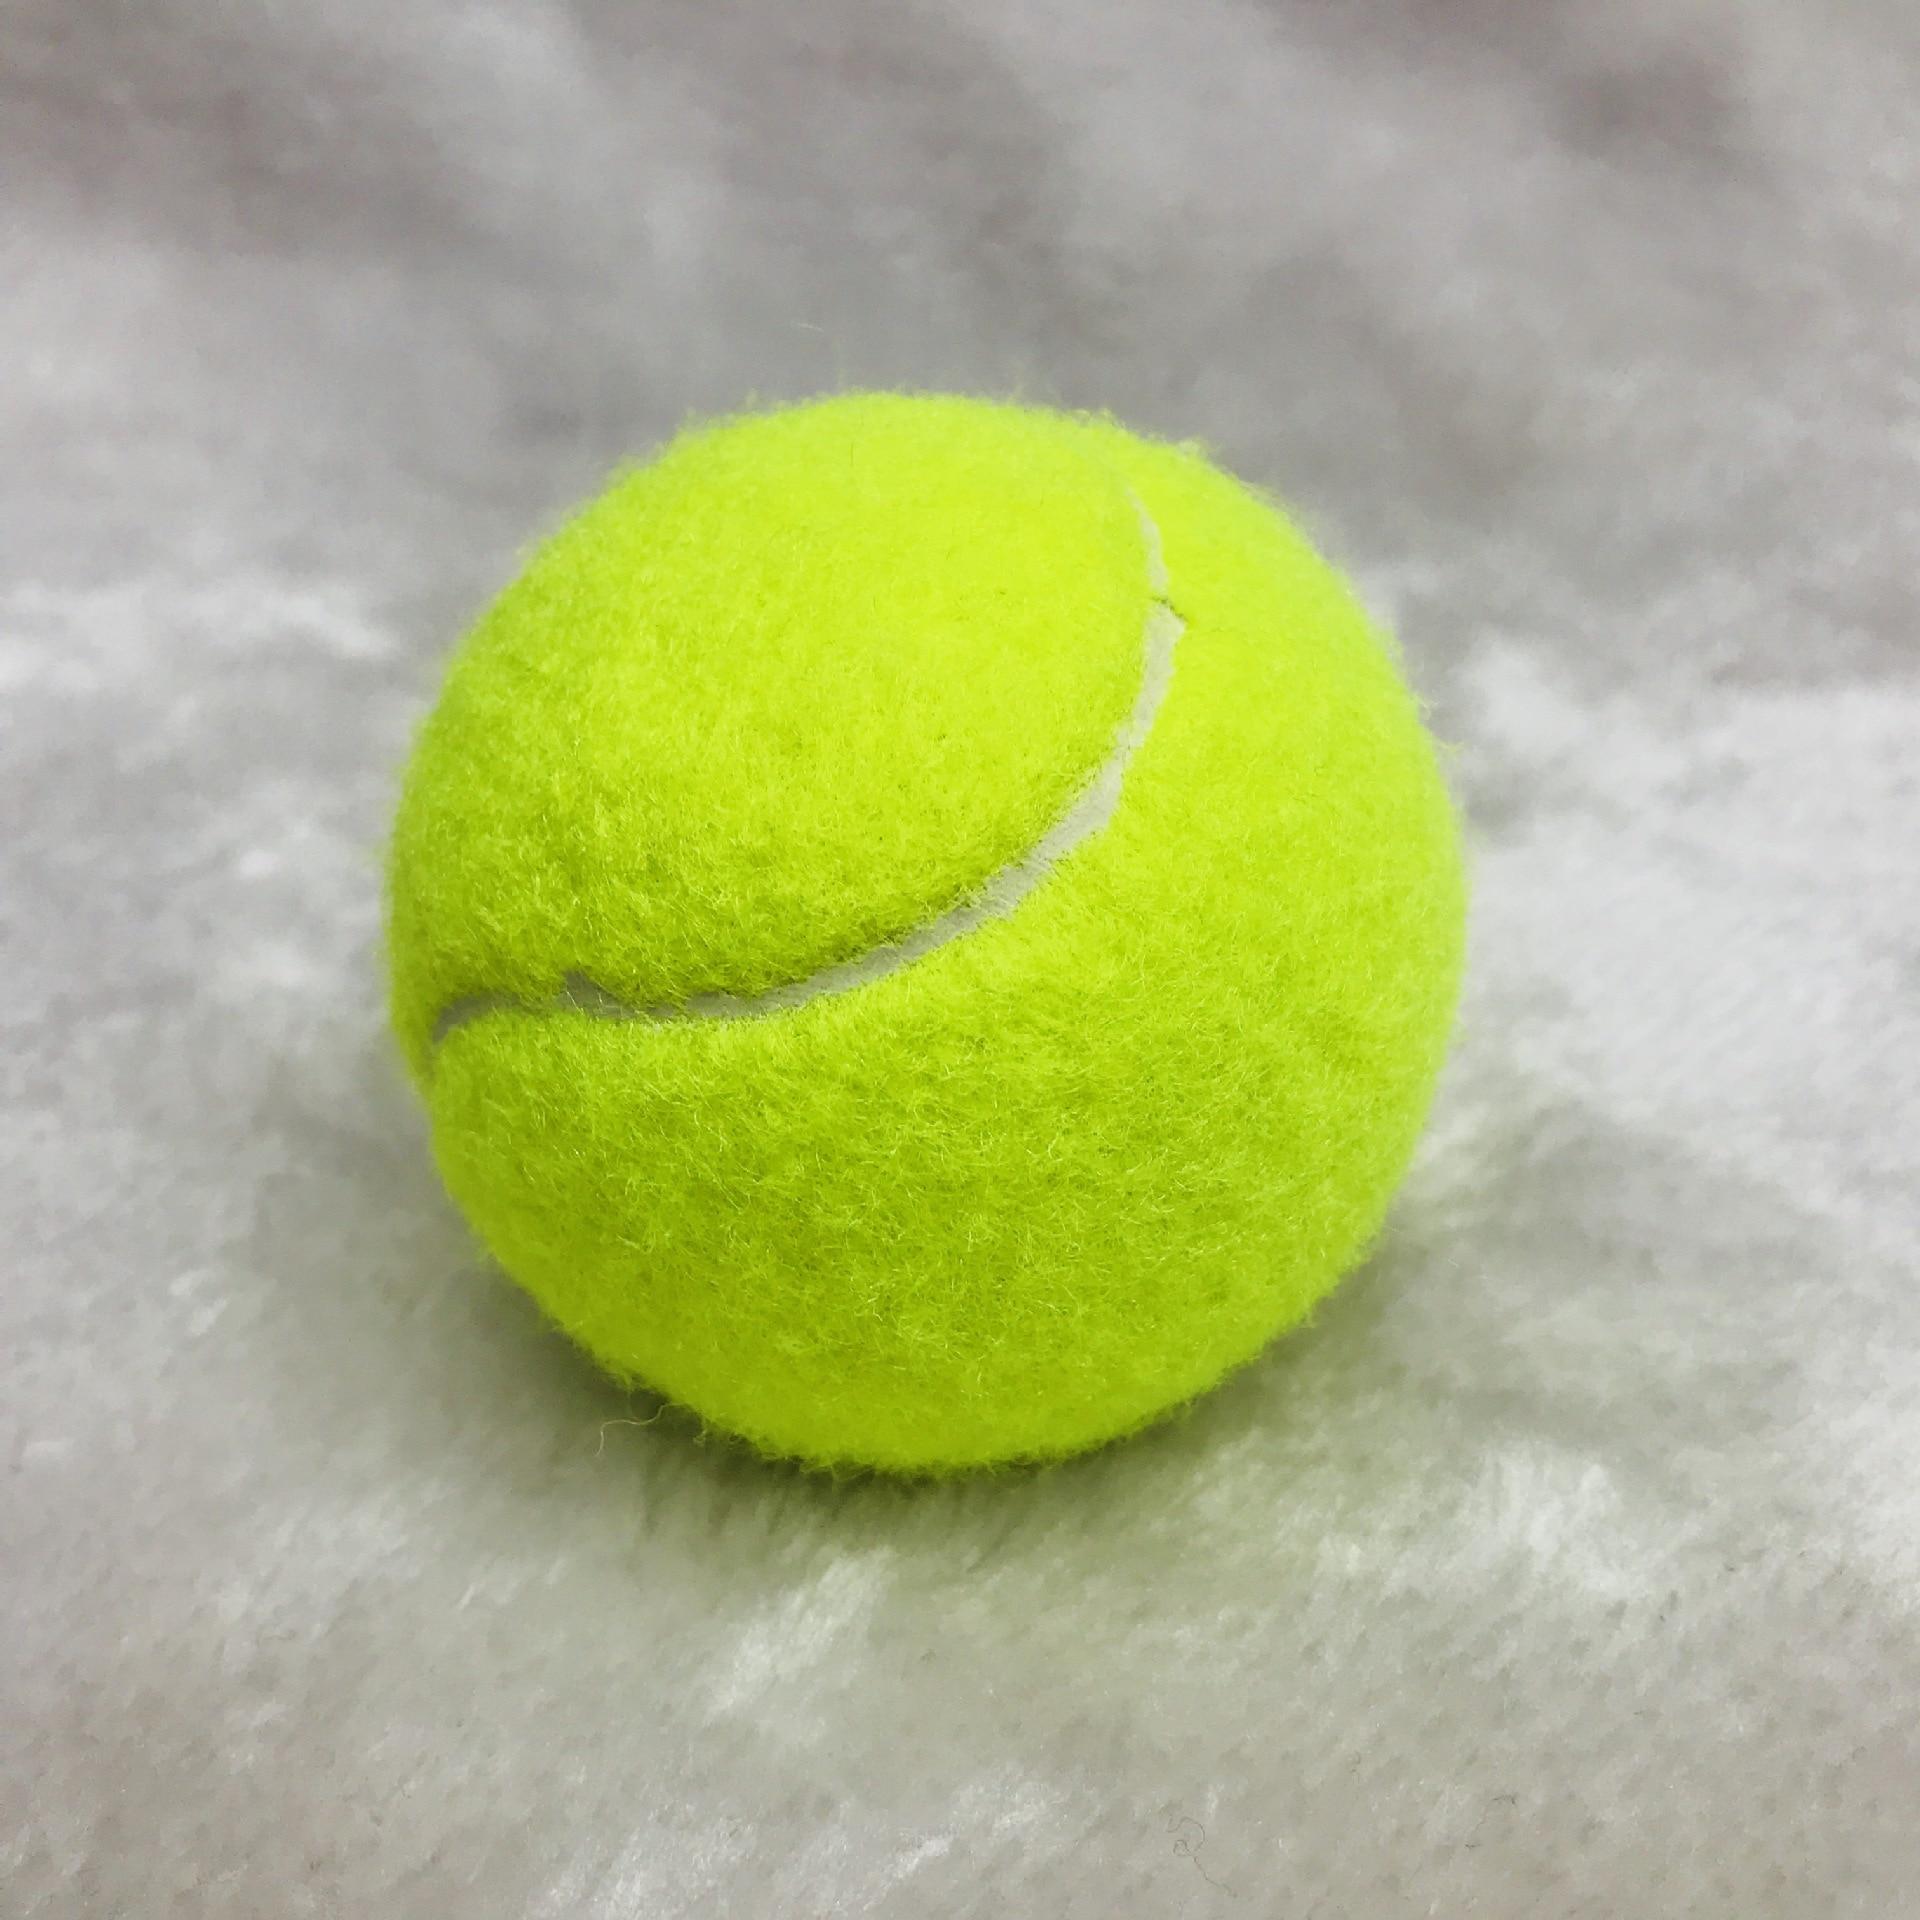 3 Pcs Training Tennis Balls  Tennis Play  Standard Bonce Ball (1. 1m ) & Durable  Best For Practice